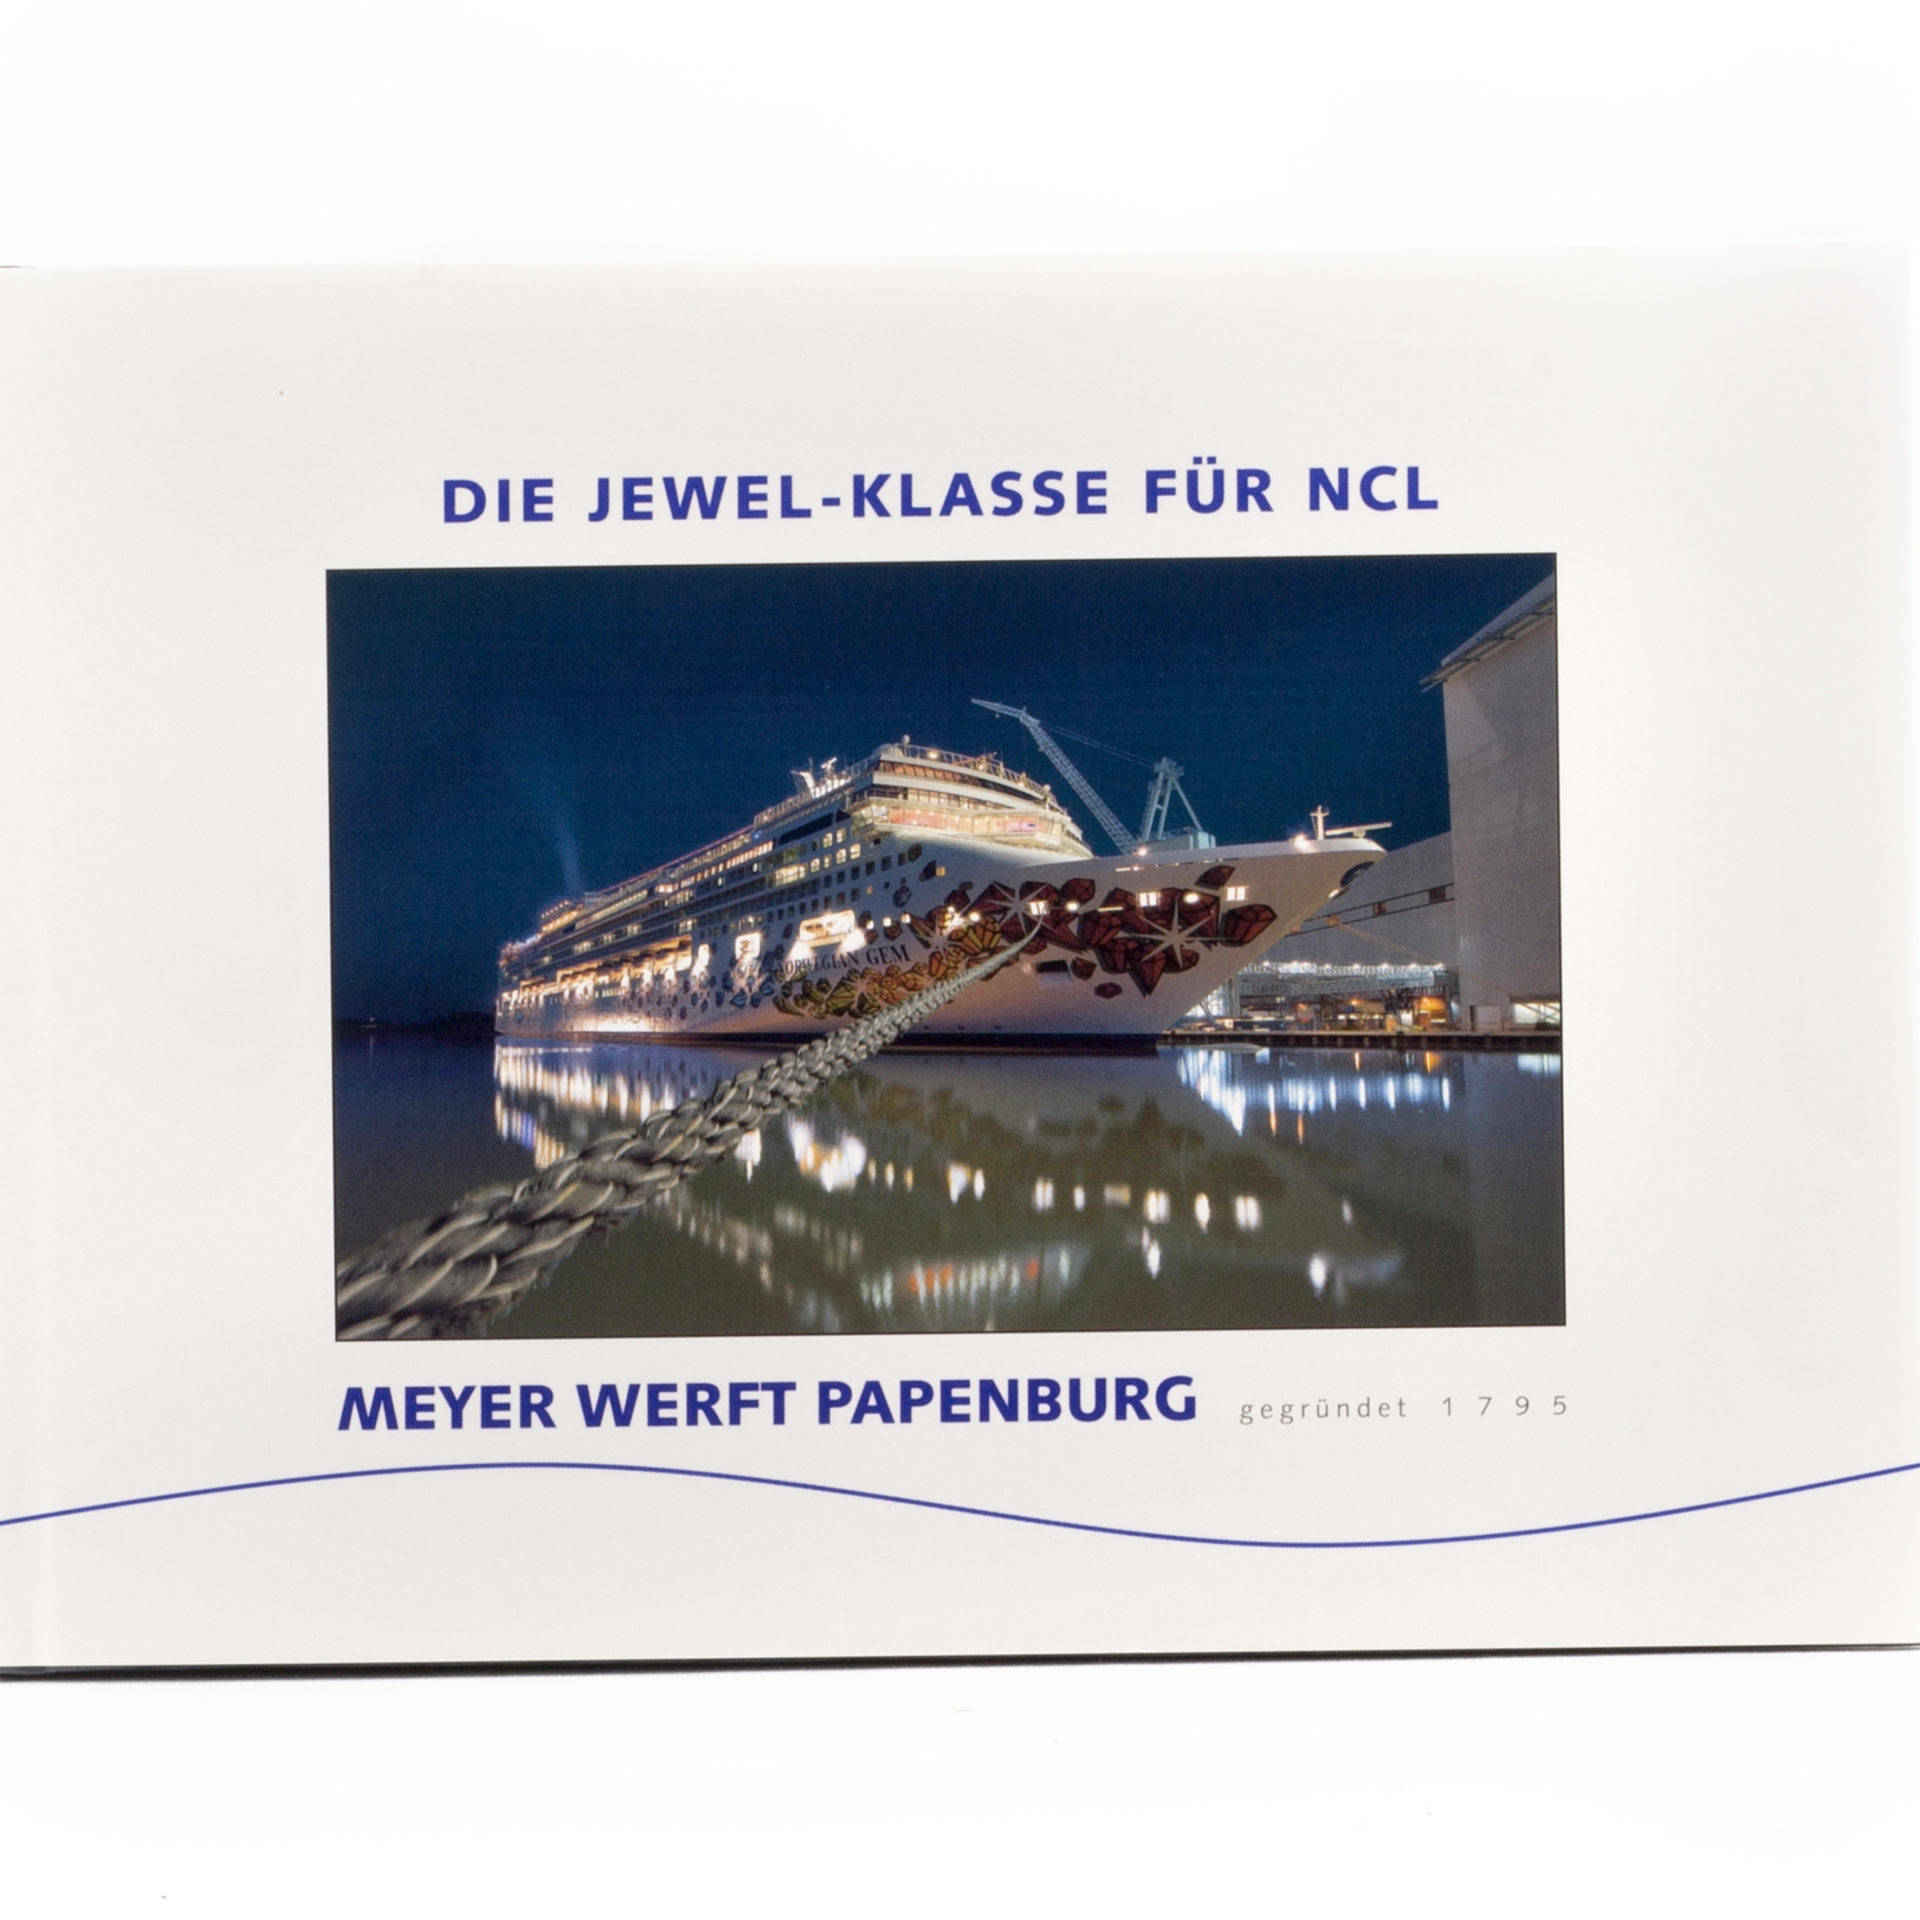 Jahrbuch Die Jewel-Klasse für NCL